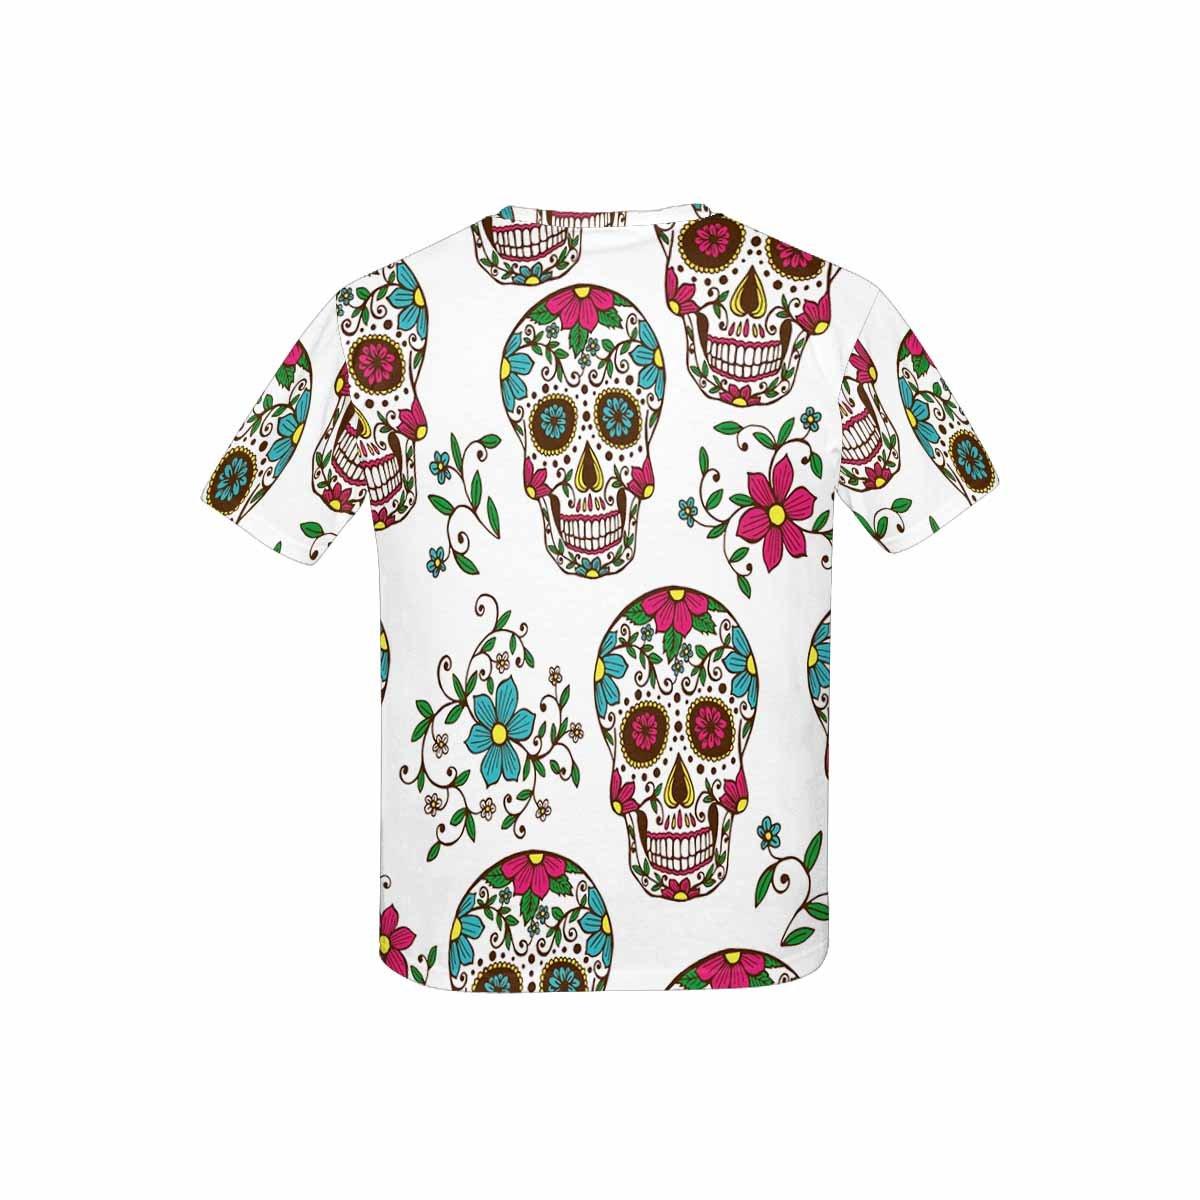 INTERESTPRINT Childs T-Shirt Skulls and Plants XS-XL